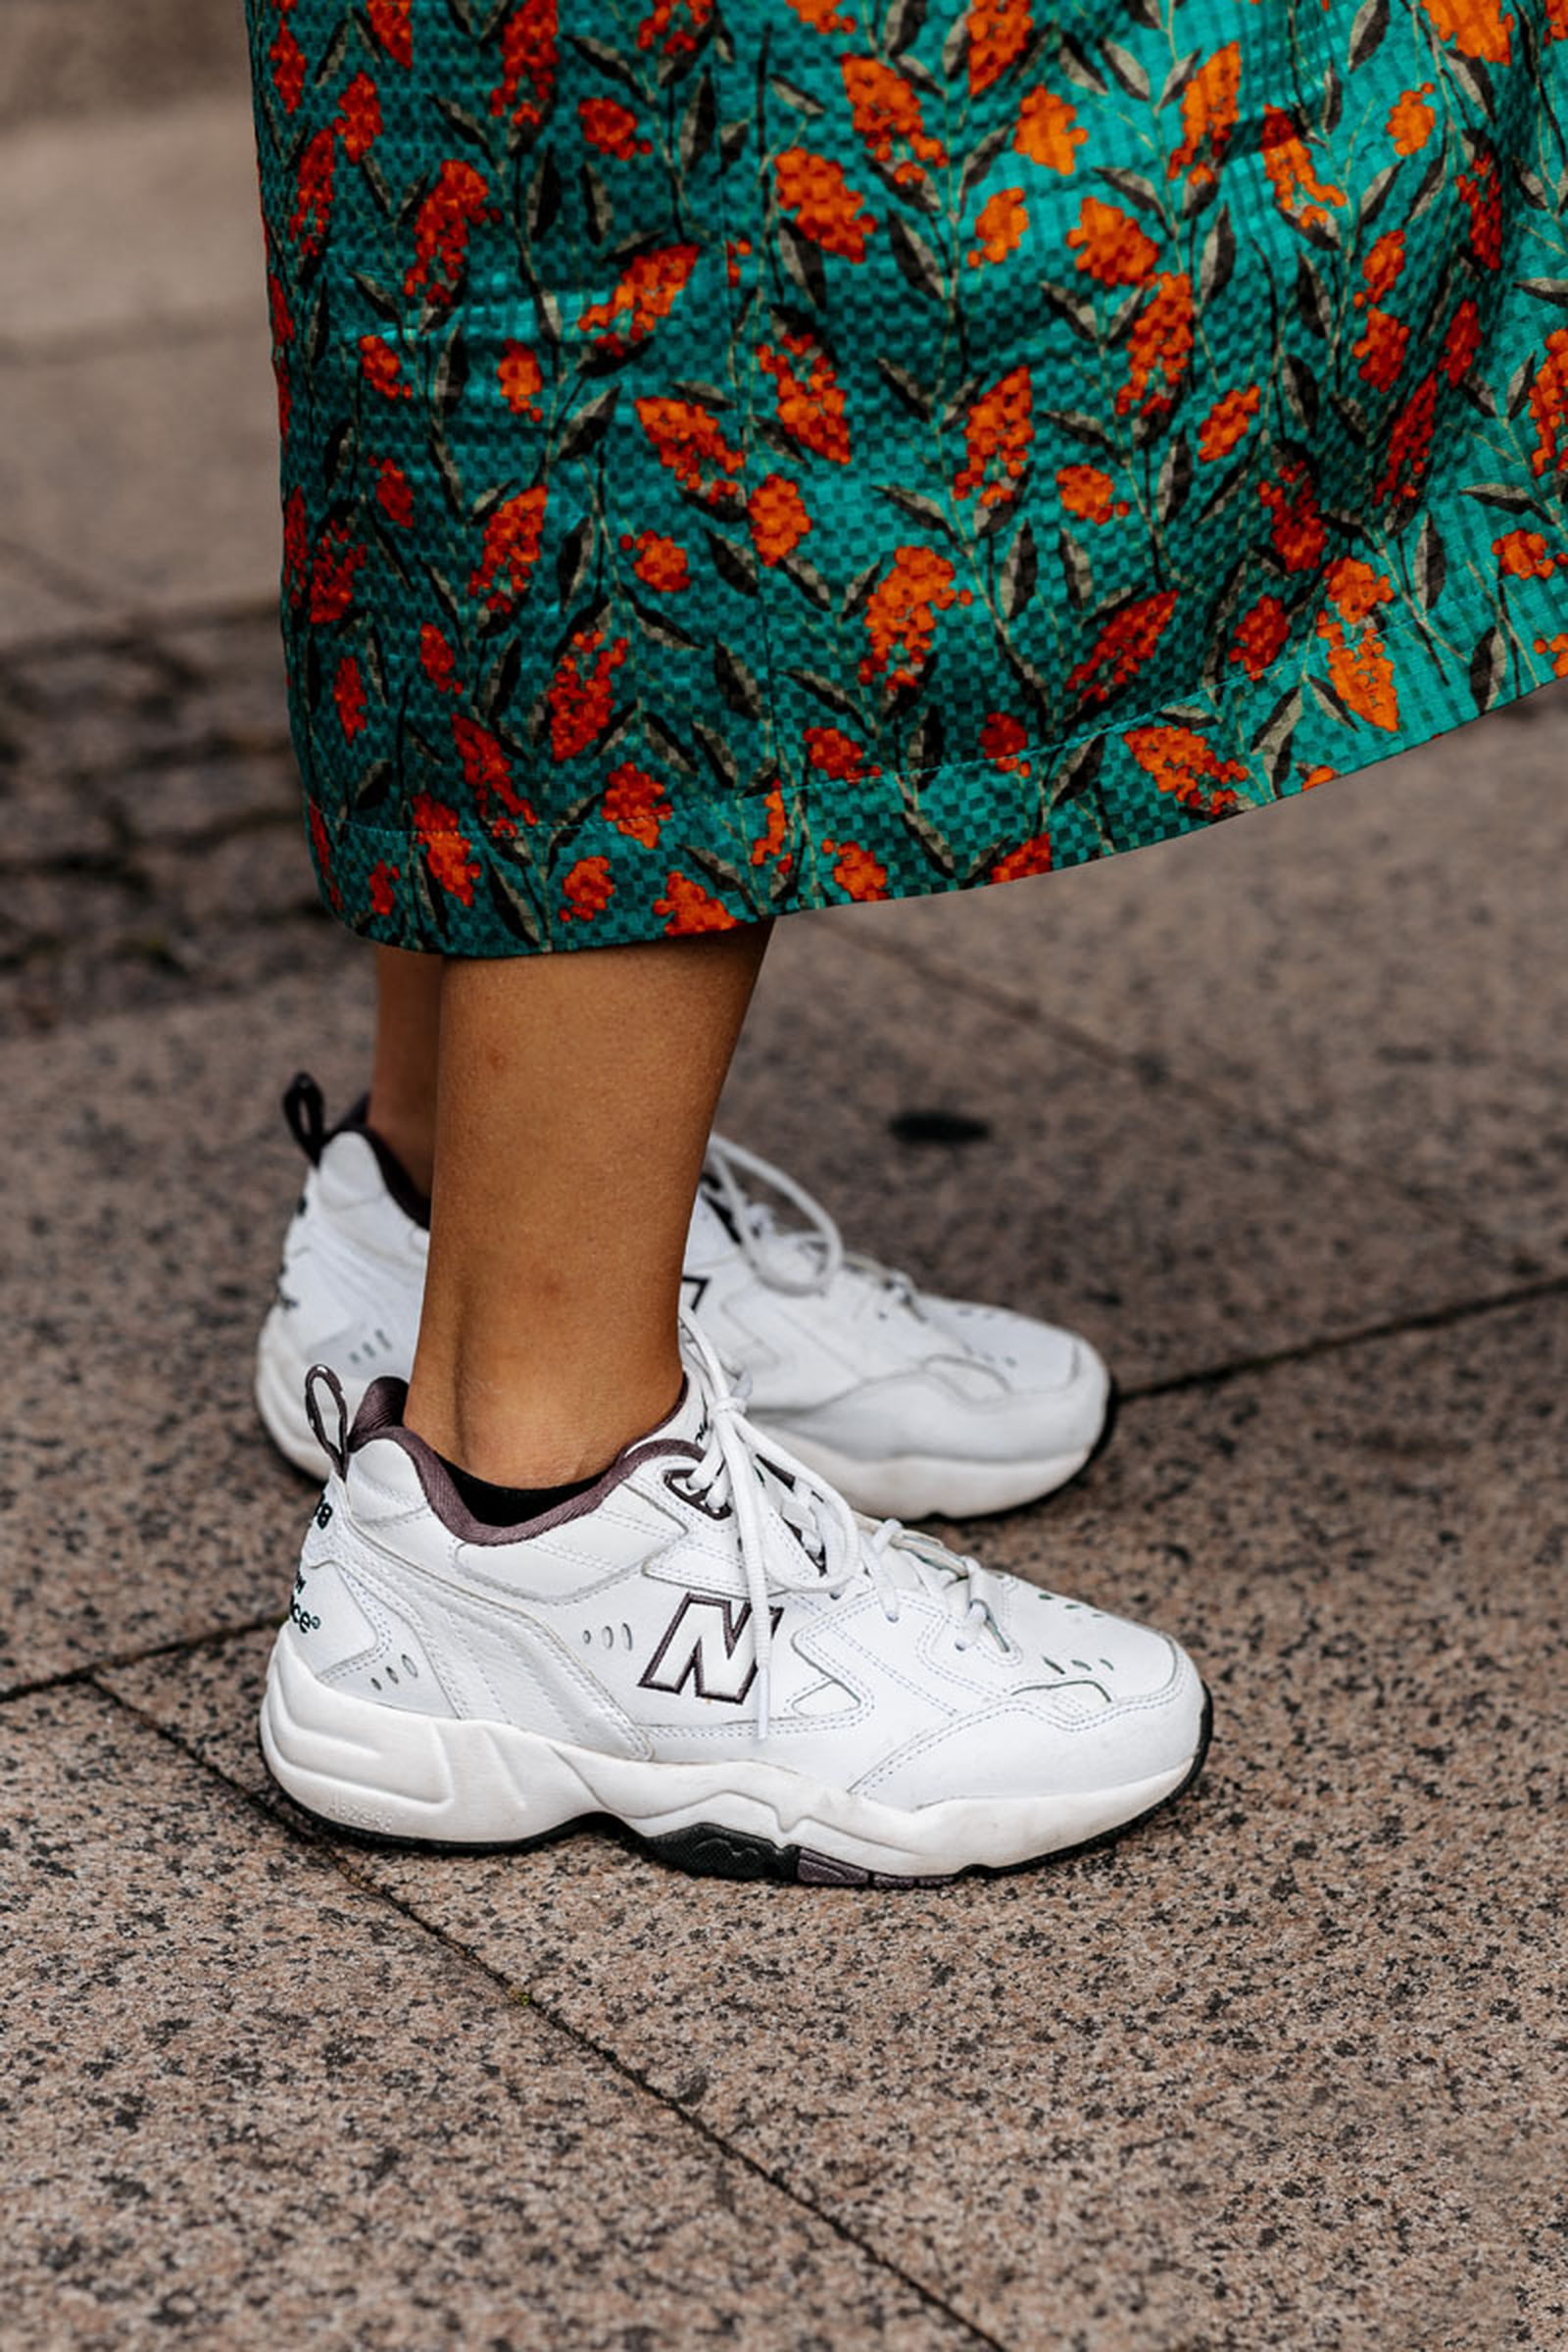 MSS20 Copenhagen StreetStyle Sneakers 02 Copenhagen Fashion Week SS20 New Balance adida